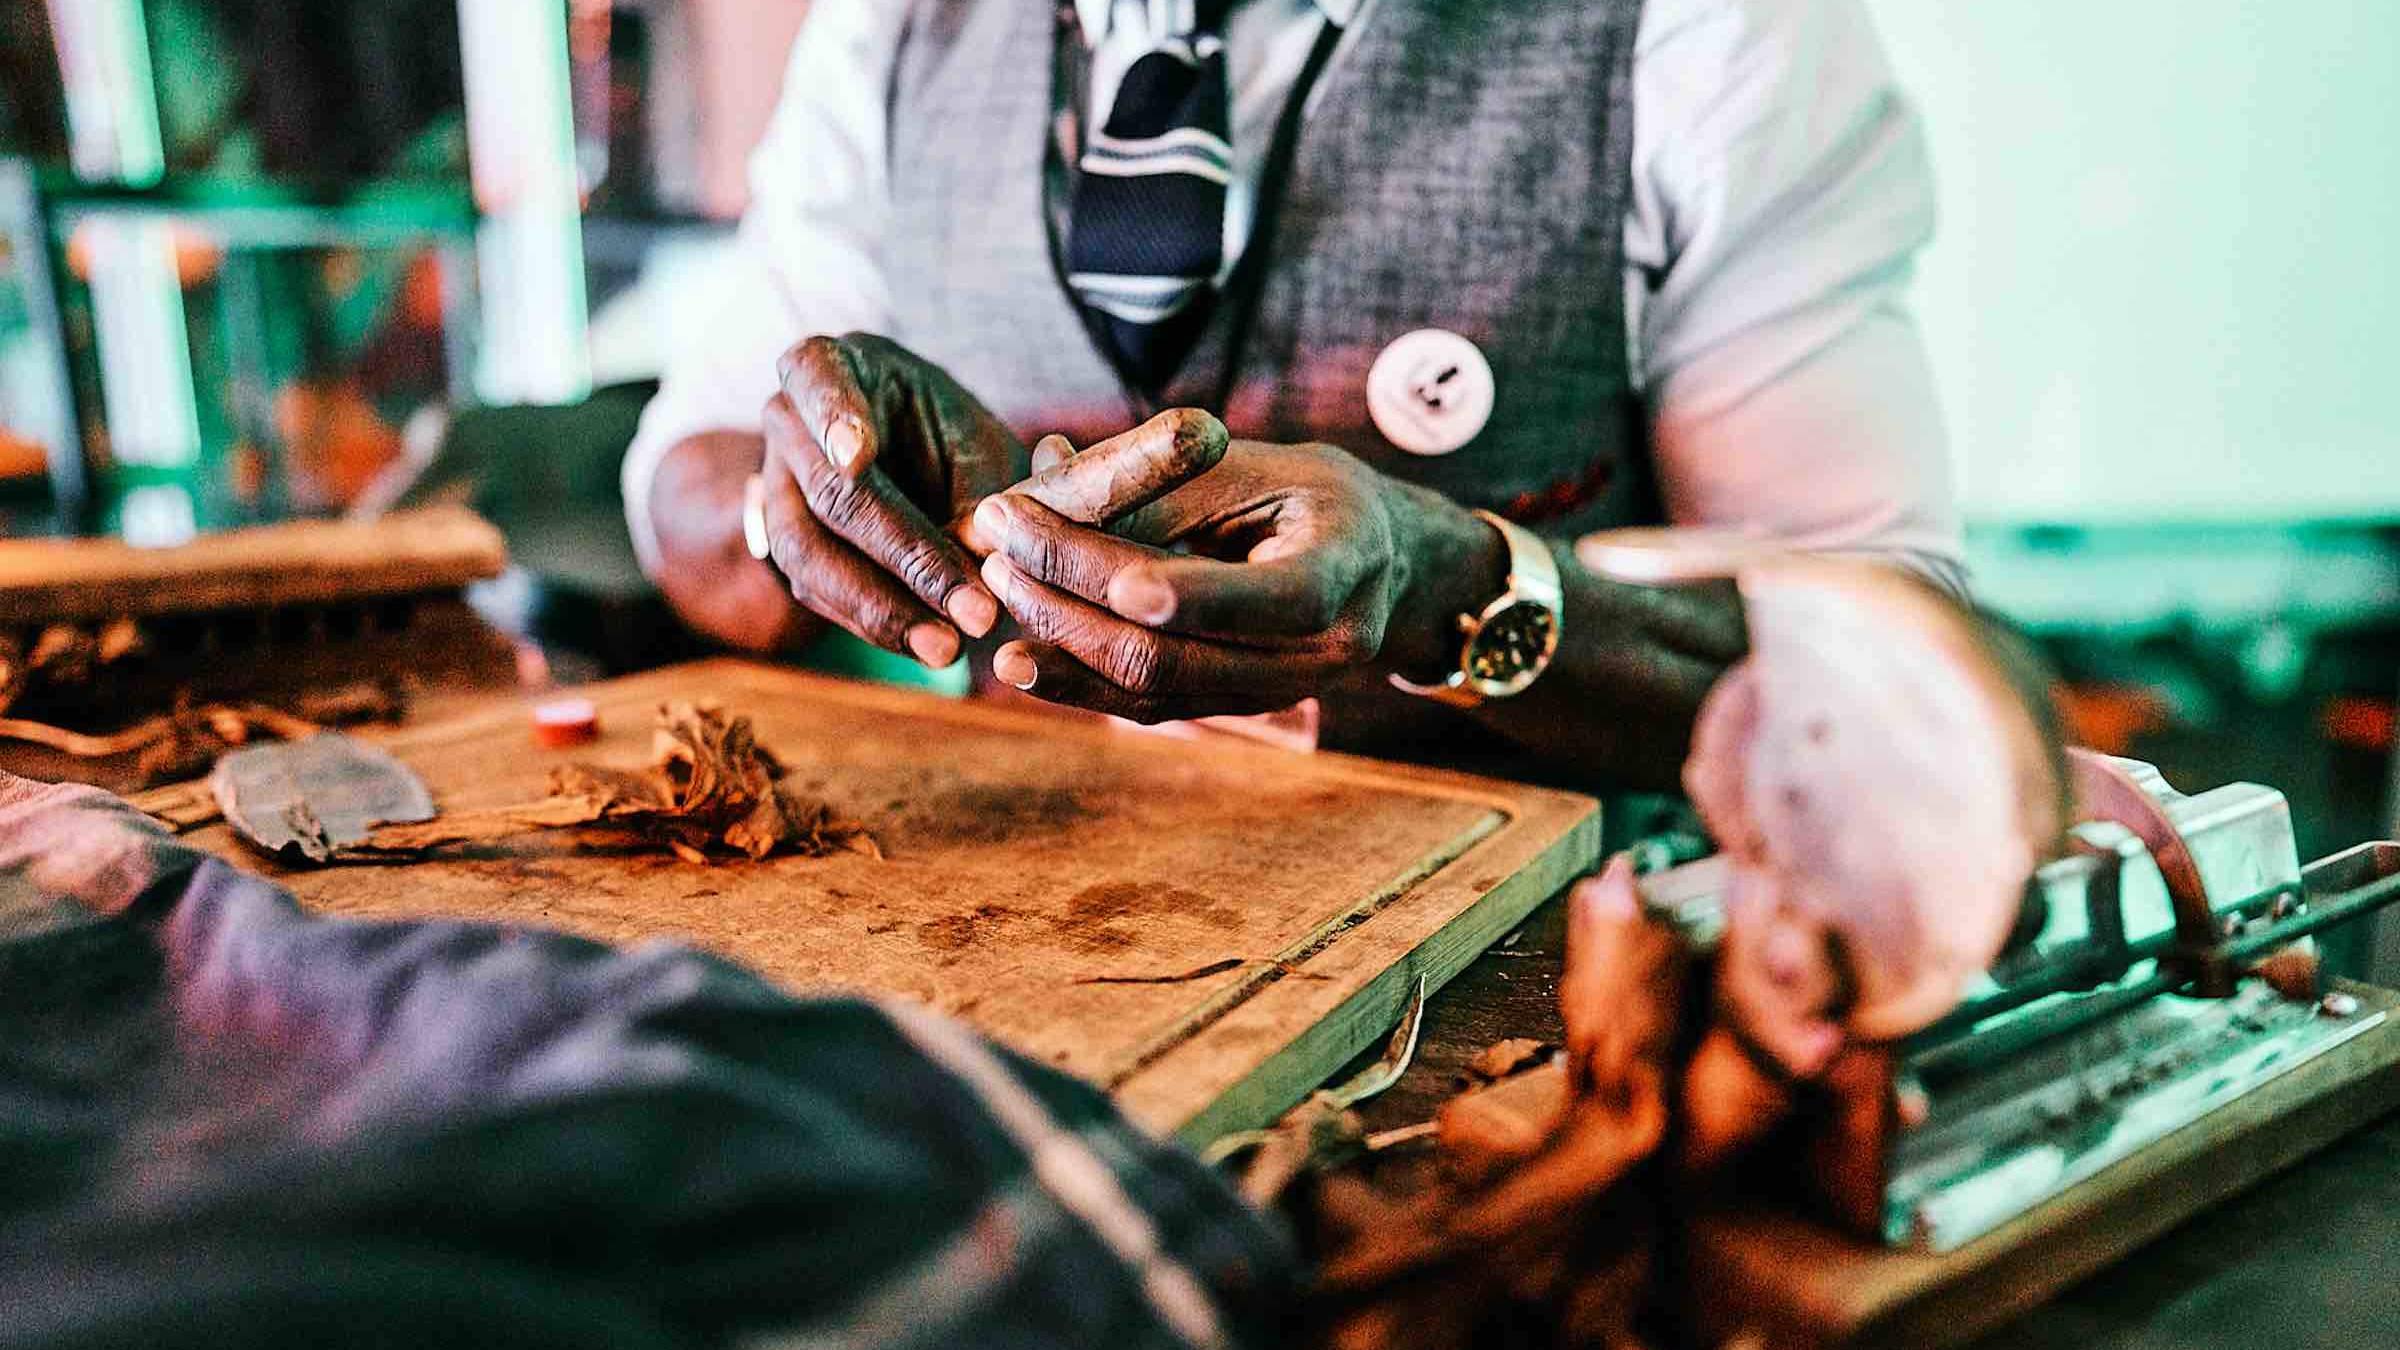 Hamburgfeiert |Partner |Zigarrenroller |Tabakroller |Zigarrendreher |Buchen |Mieten |Anfragen